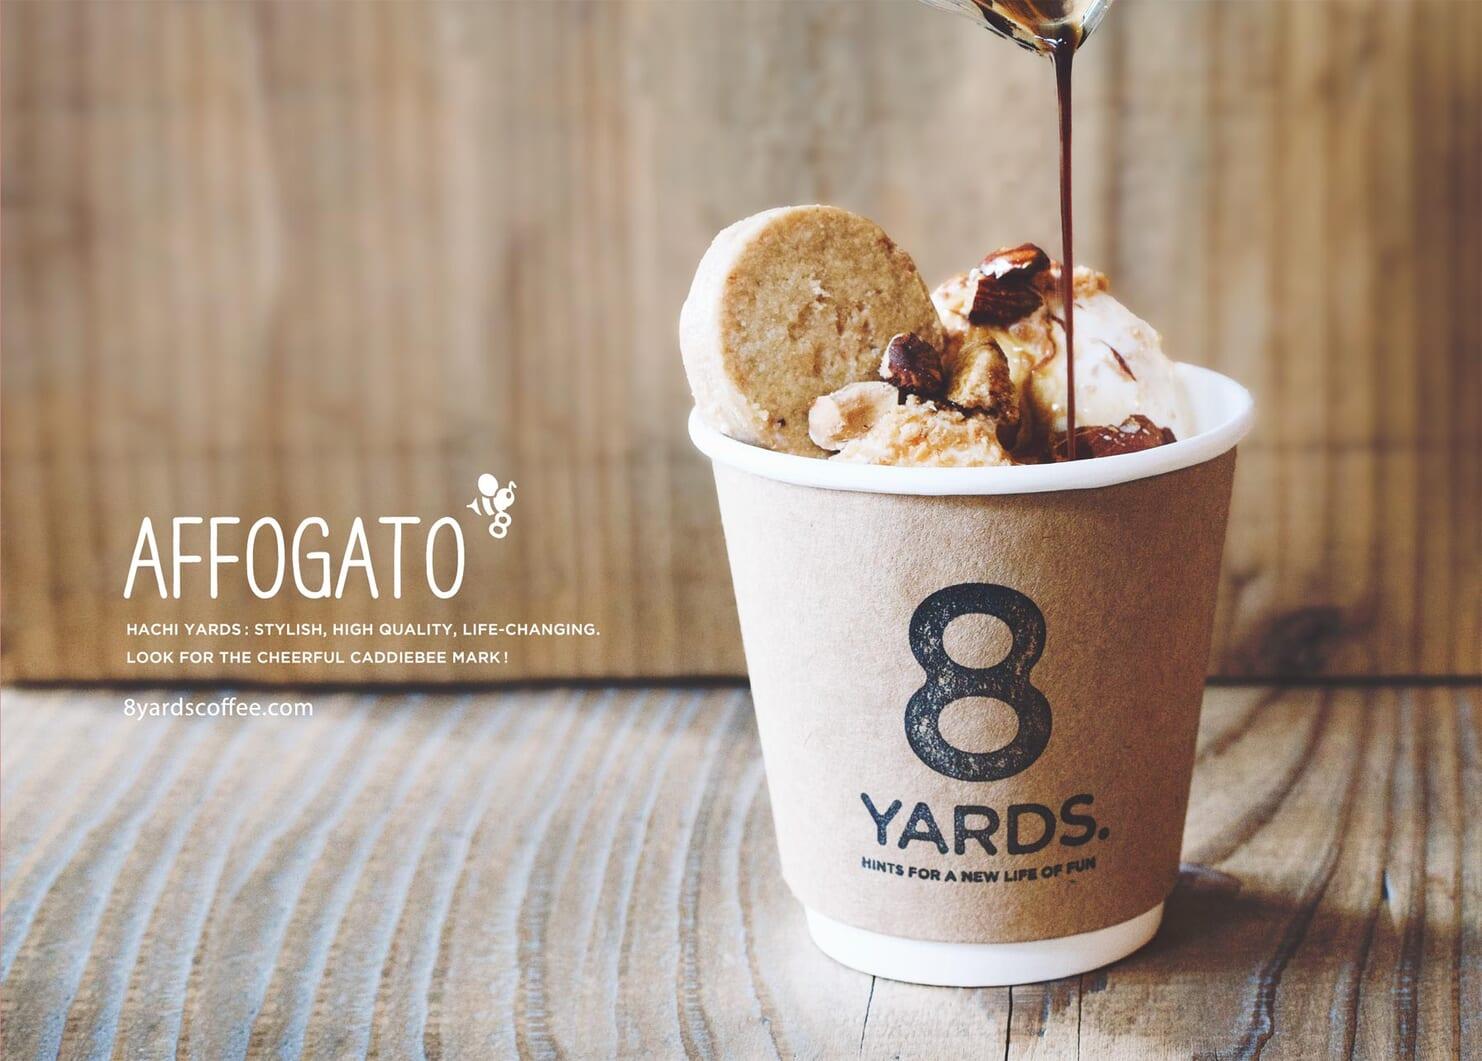 8 yards coffee jiyugaoka